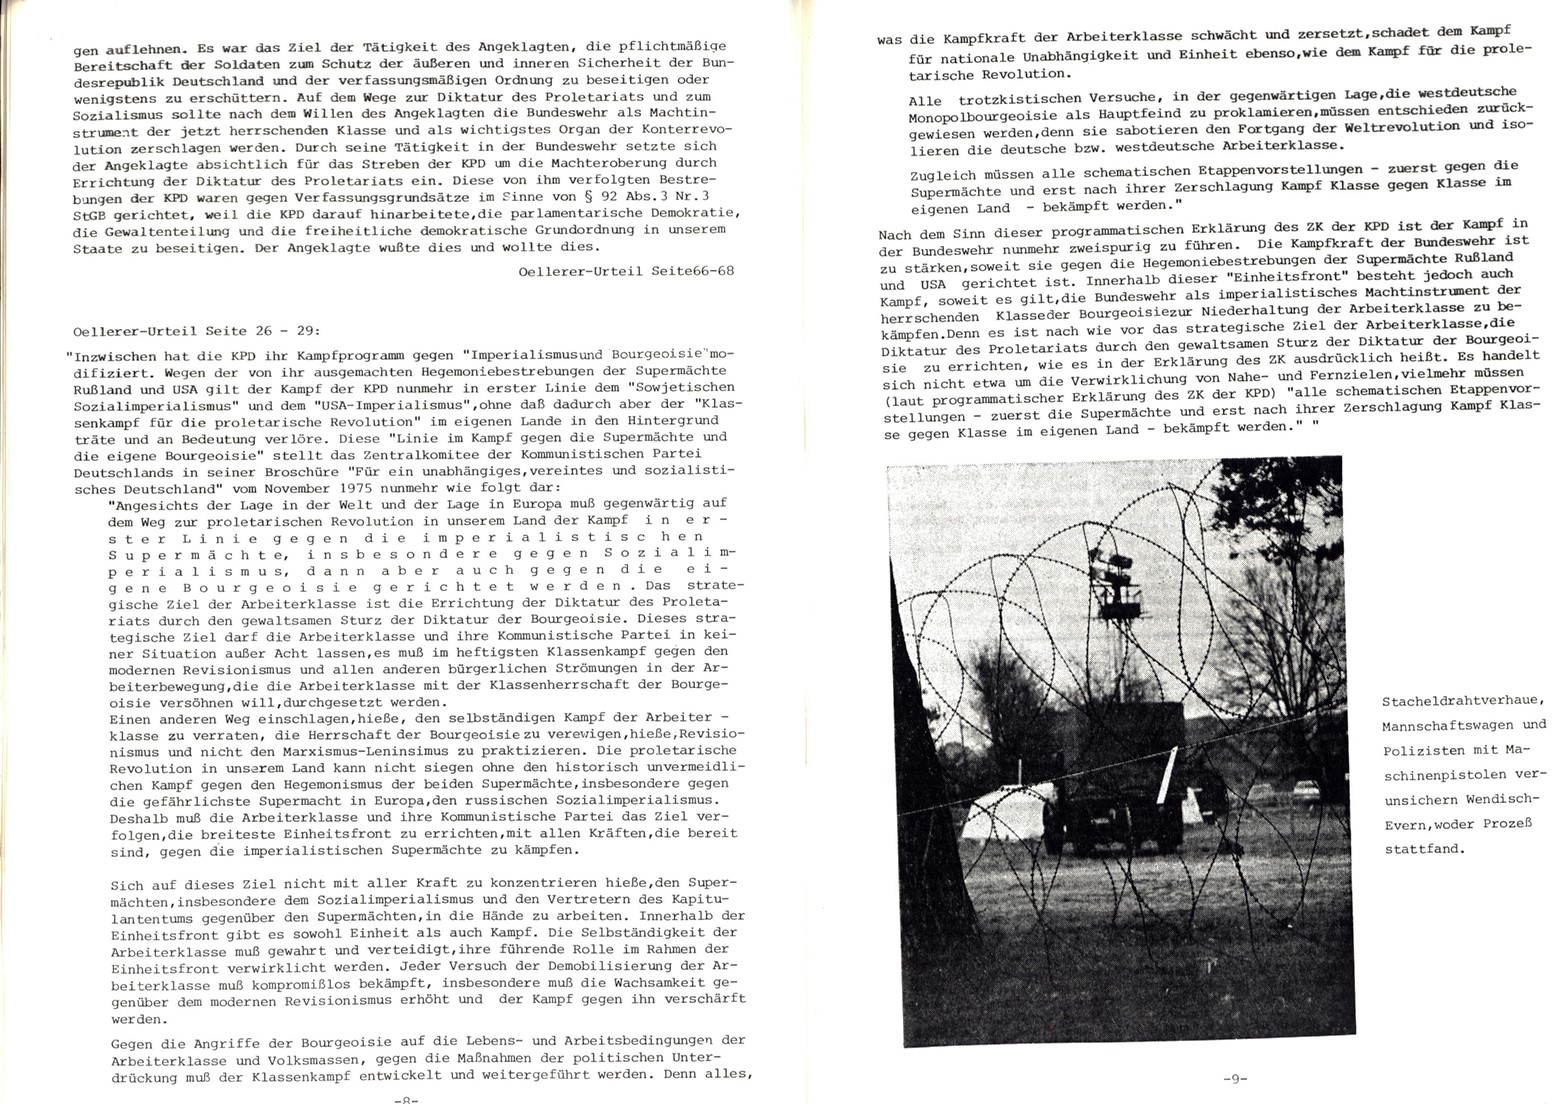 KPDAO_1976_Staatsschutzparagrafen_05